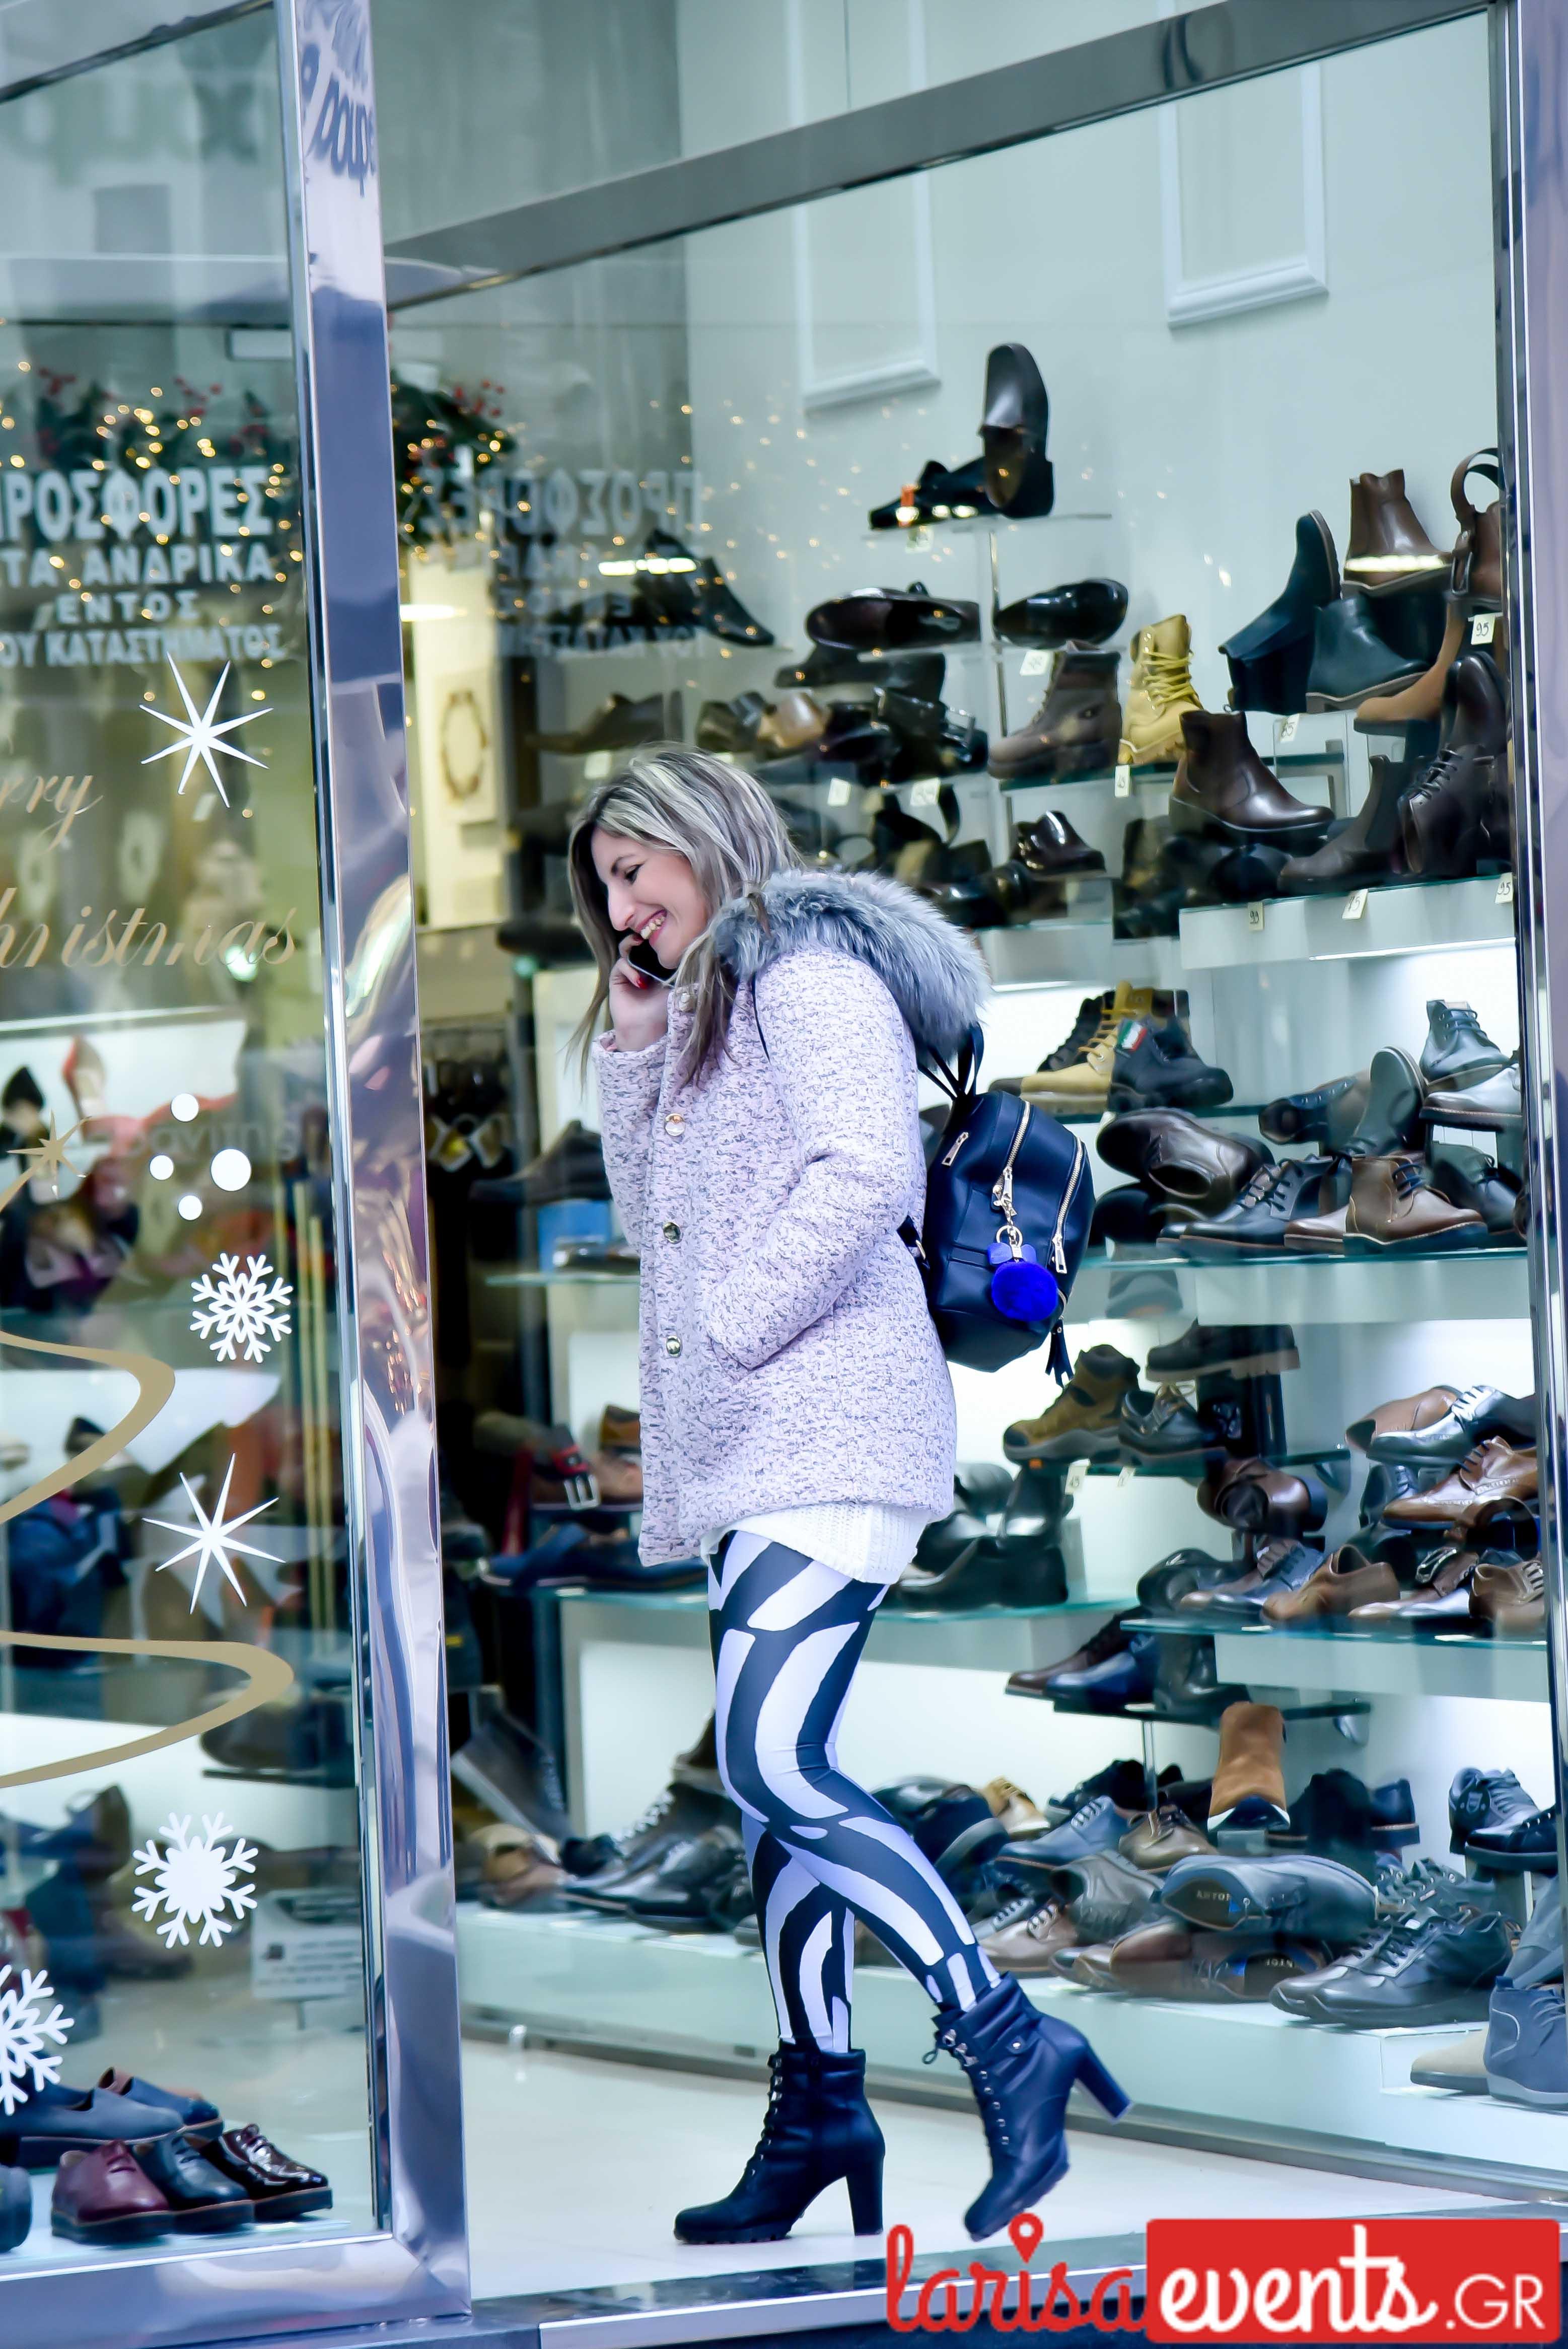 LAZ 7392 - Λάρισα's Street Style | Οι γυναίκες της πόλης σε street style clicks!